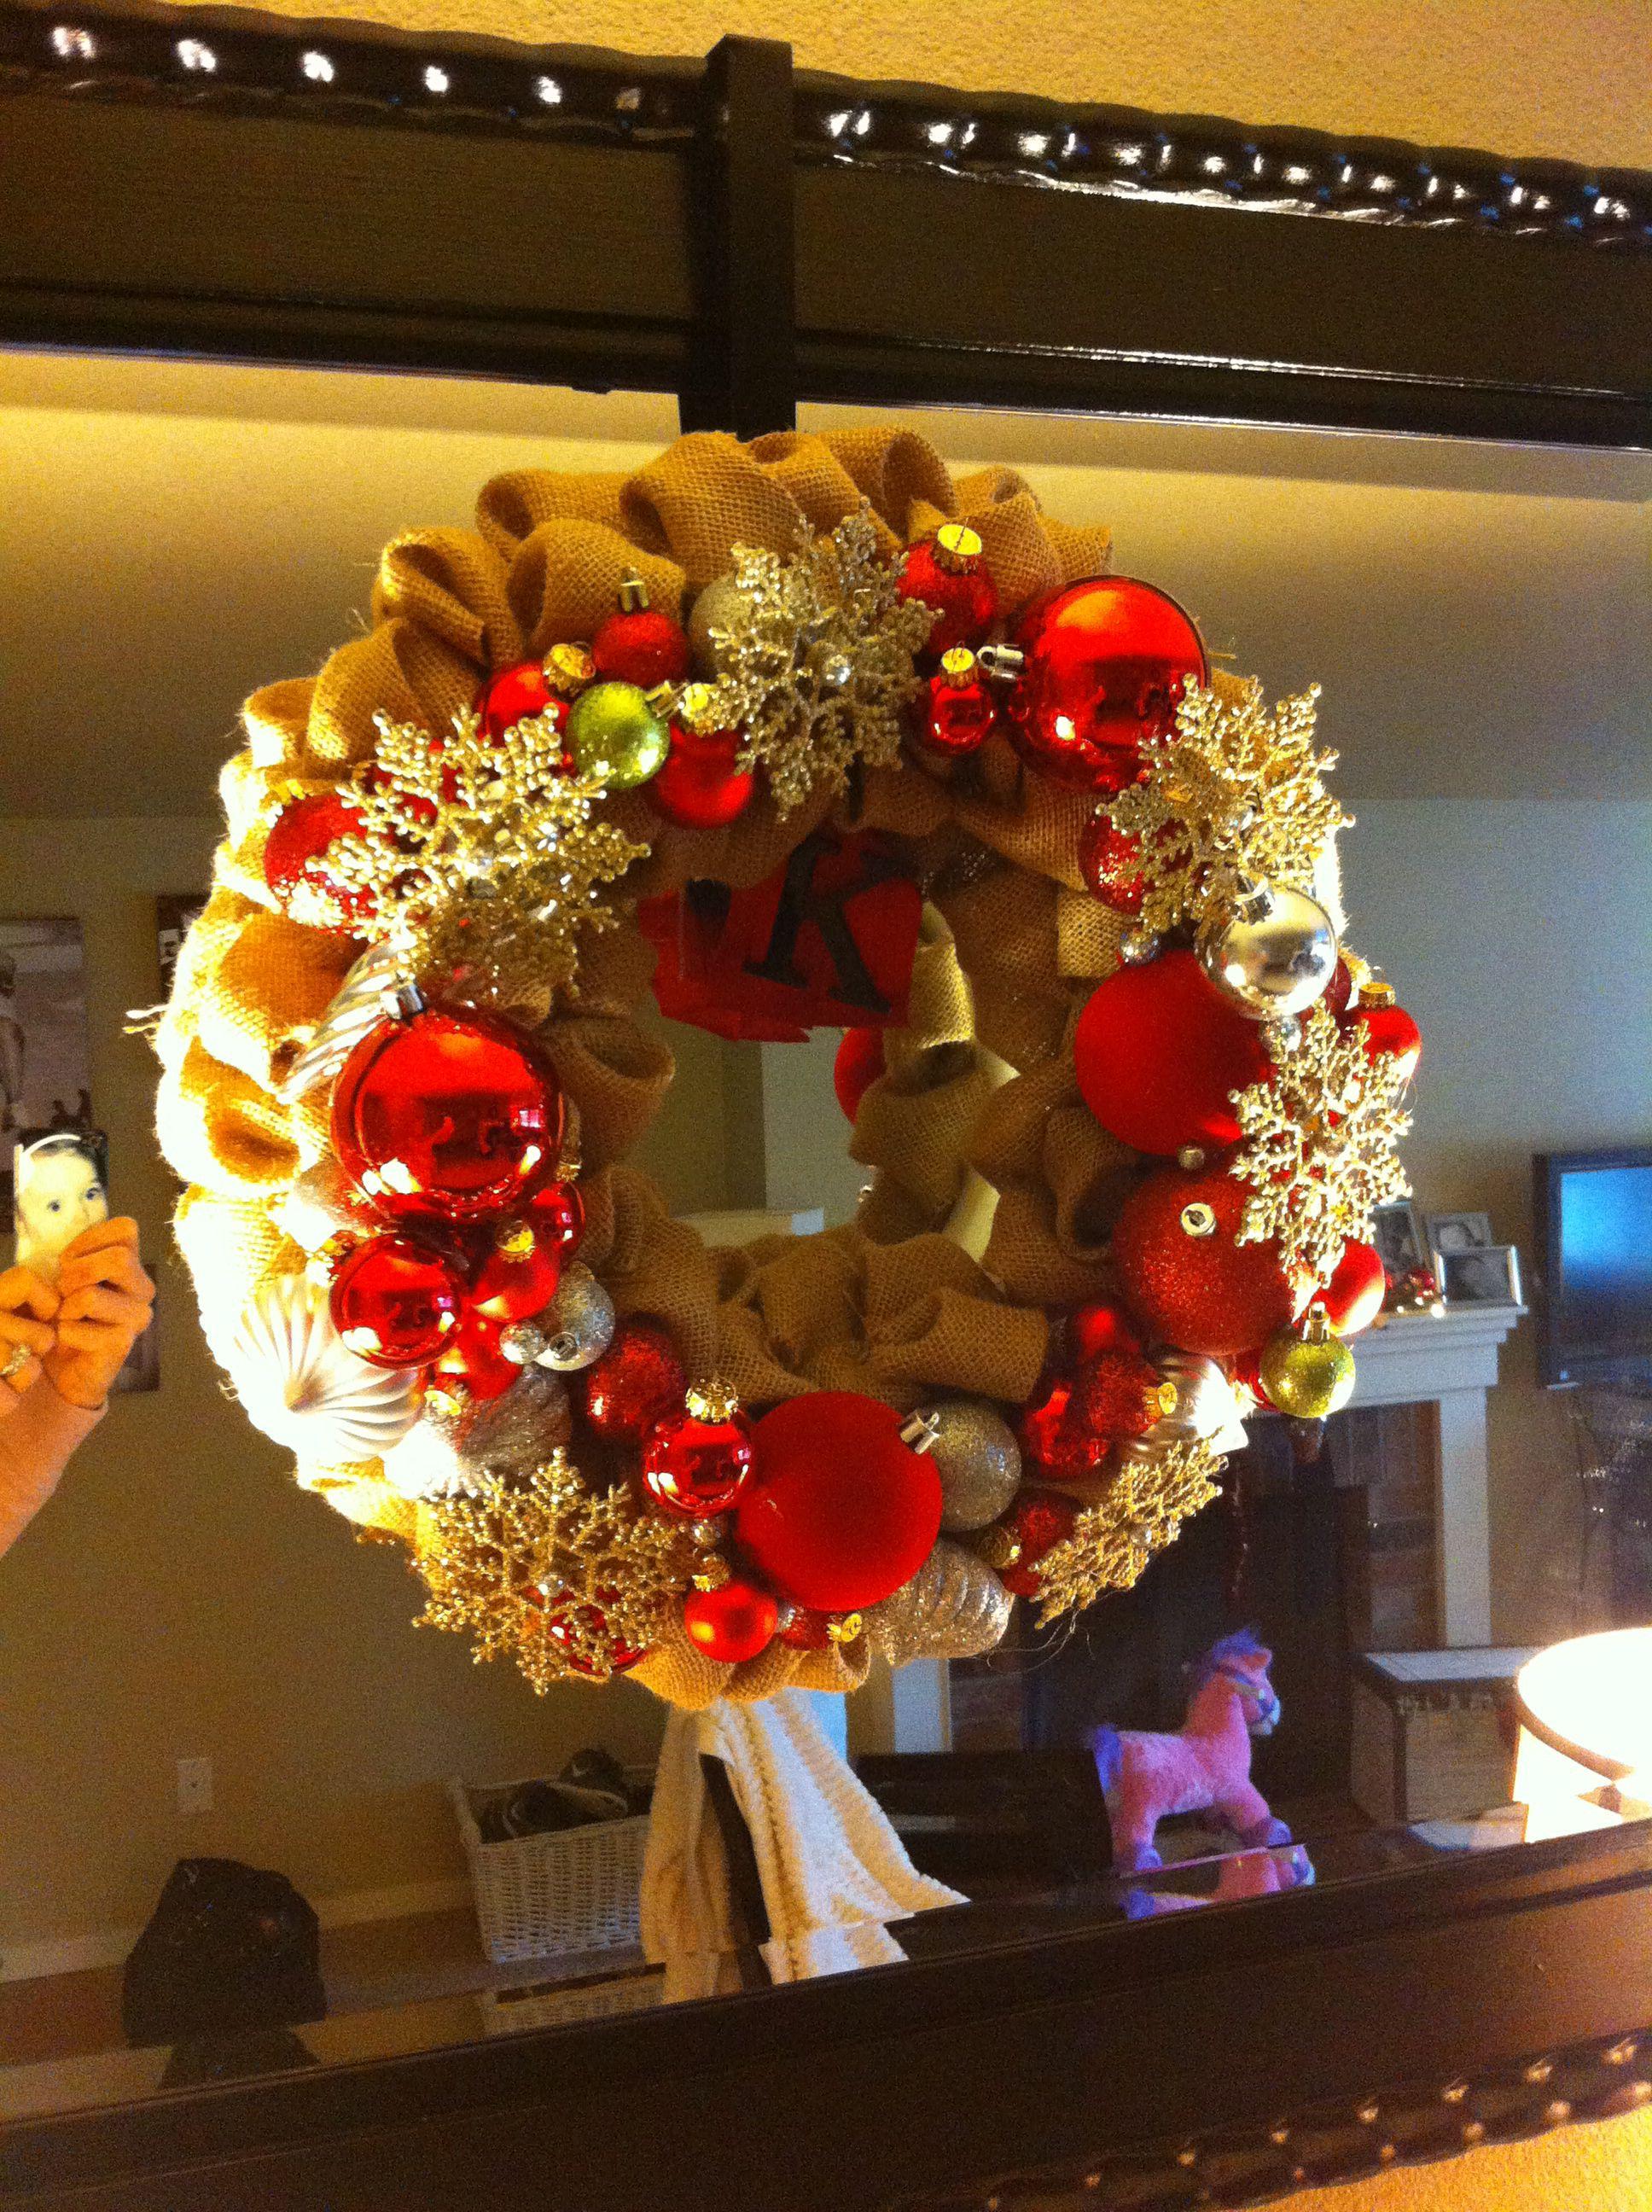 Hot glued old Christmas ornaments onto a burlap wrapped foam wreath ...